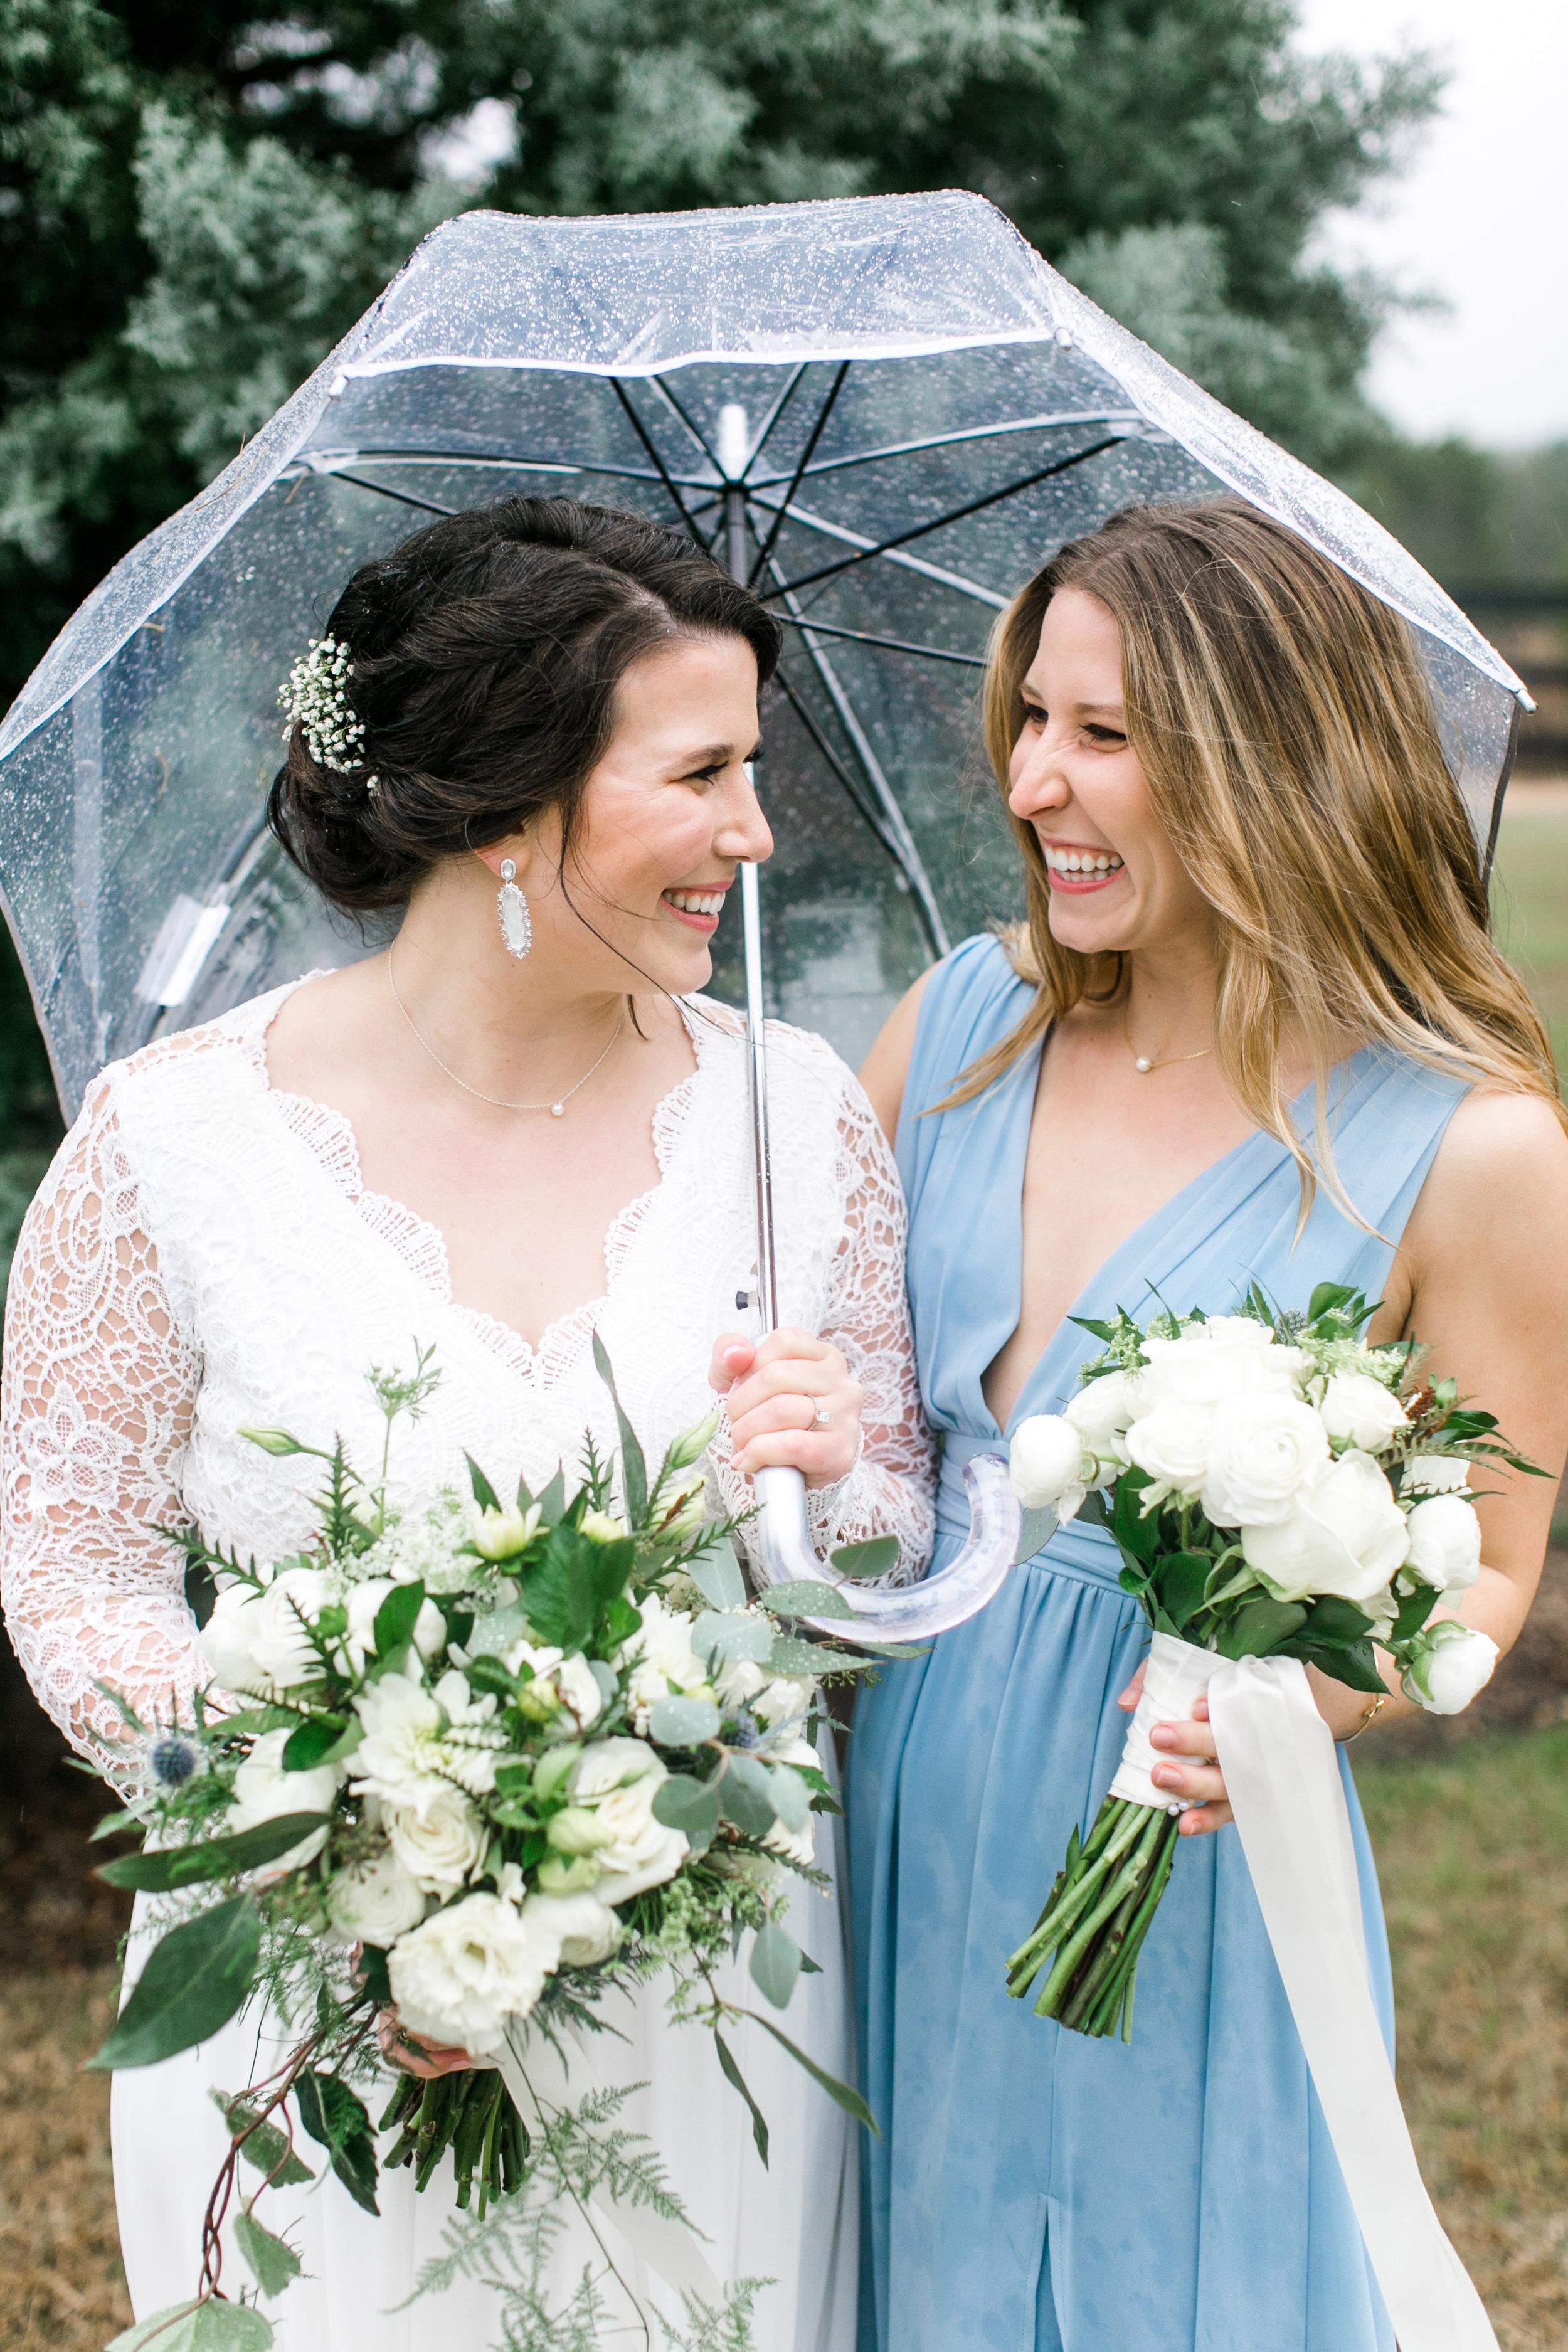 Austin_Texas_Fine_Art_Wedding_Photographer_Kayla_Snell_Photography_Antebellum_Oaks398.jpg